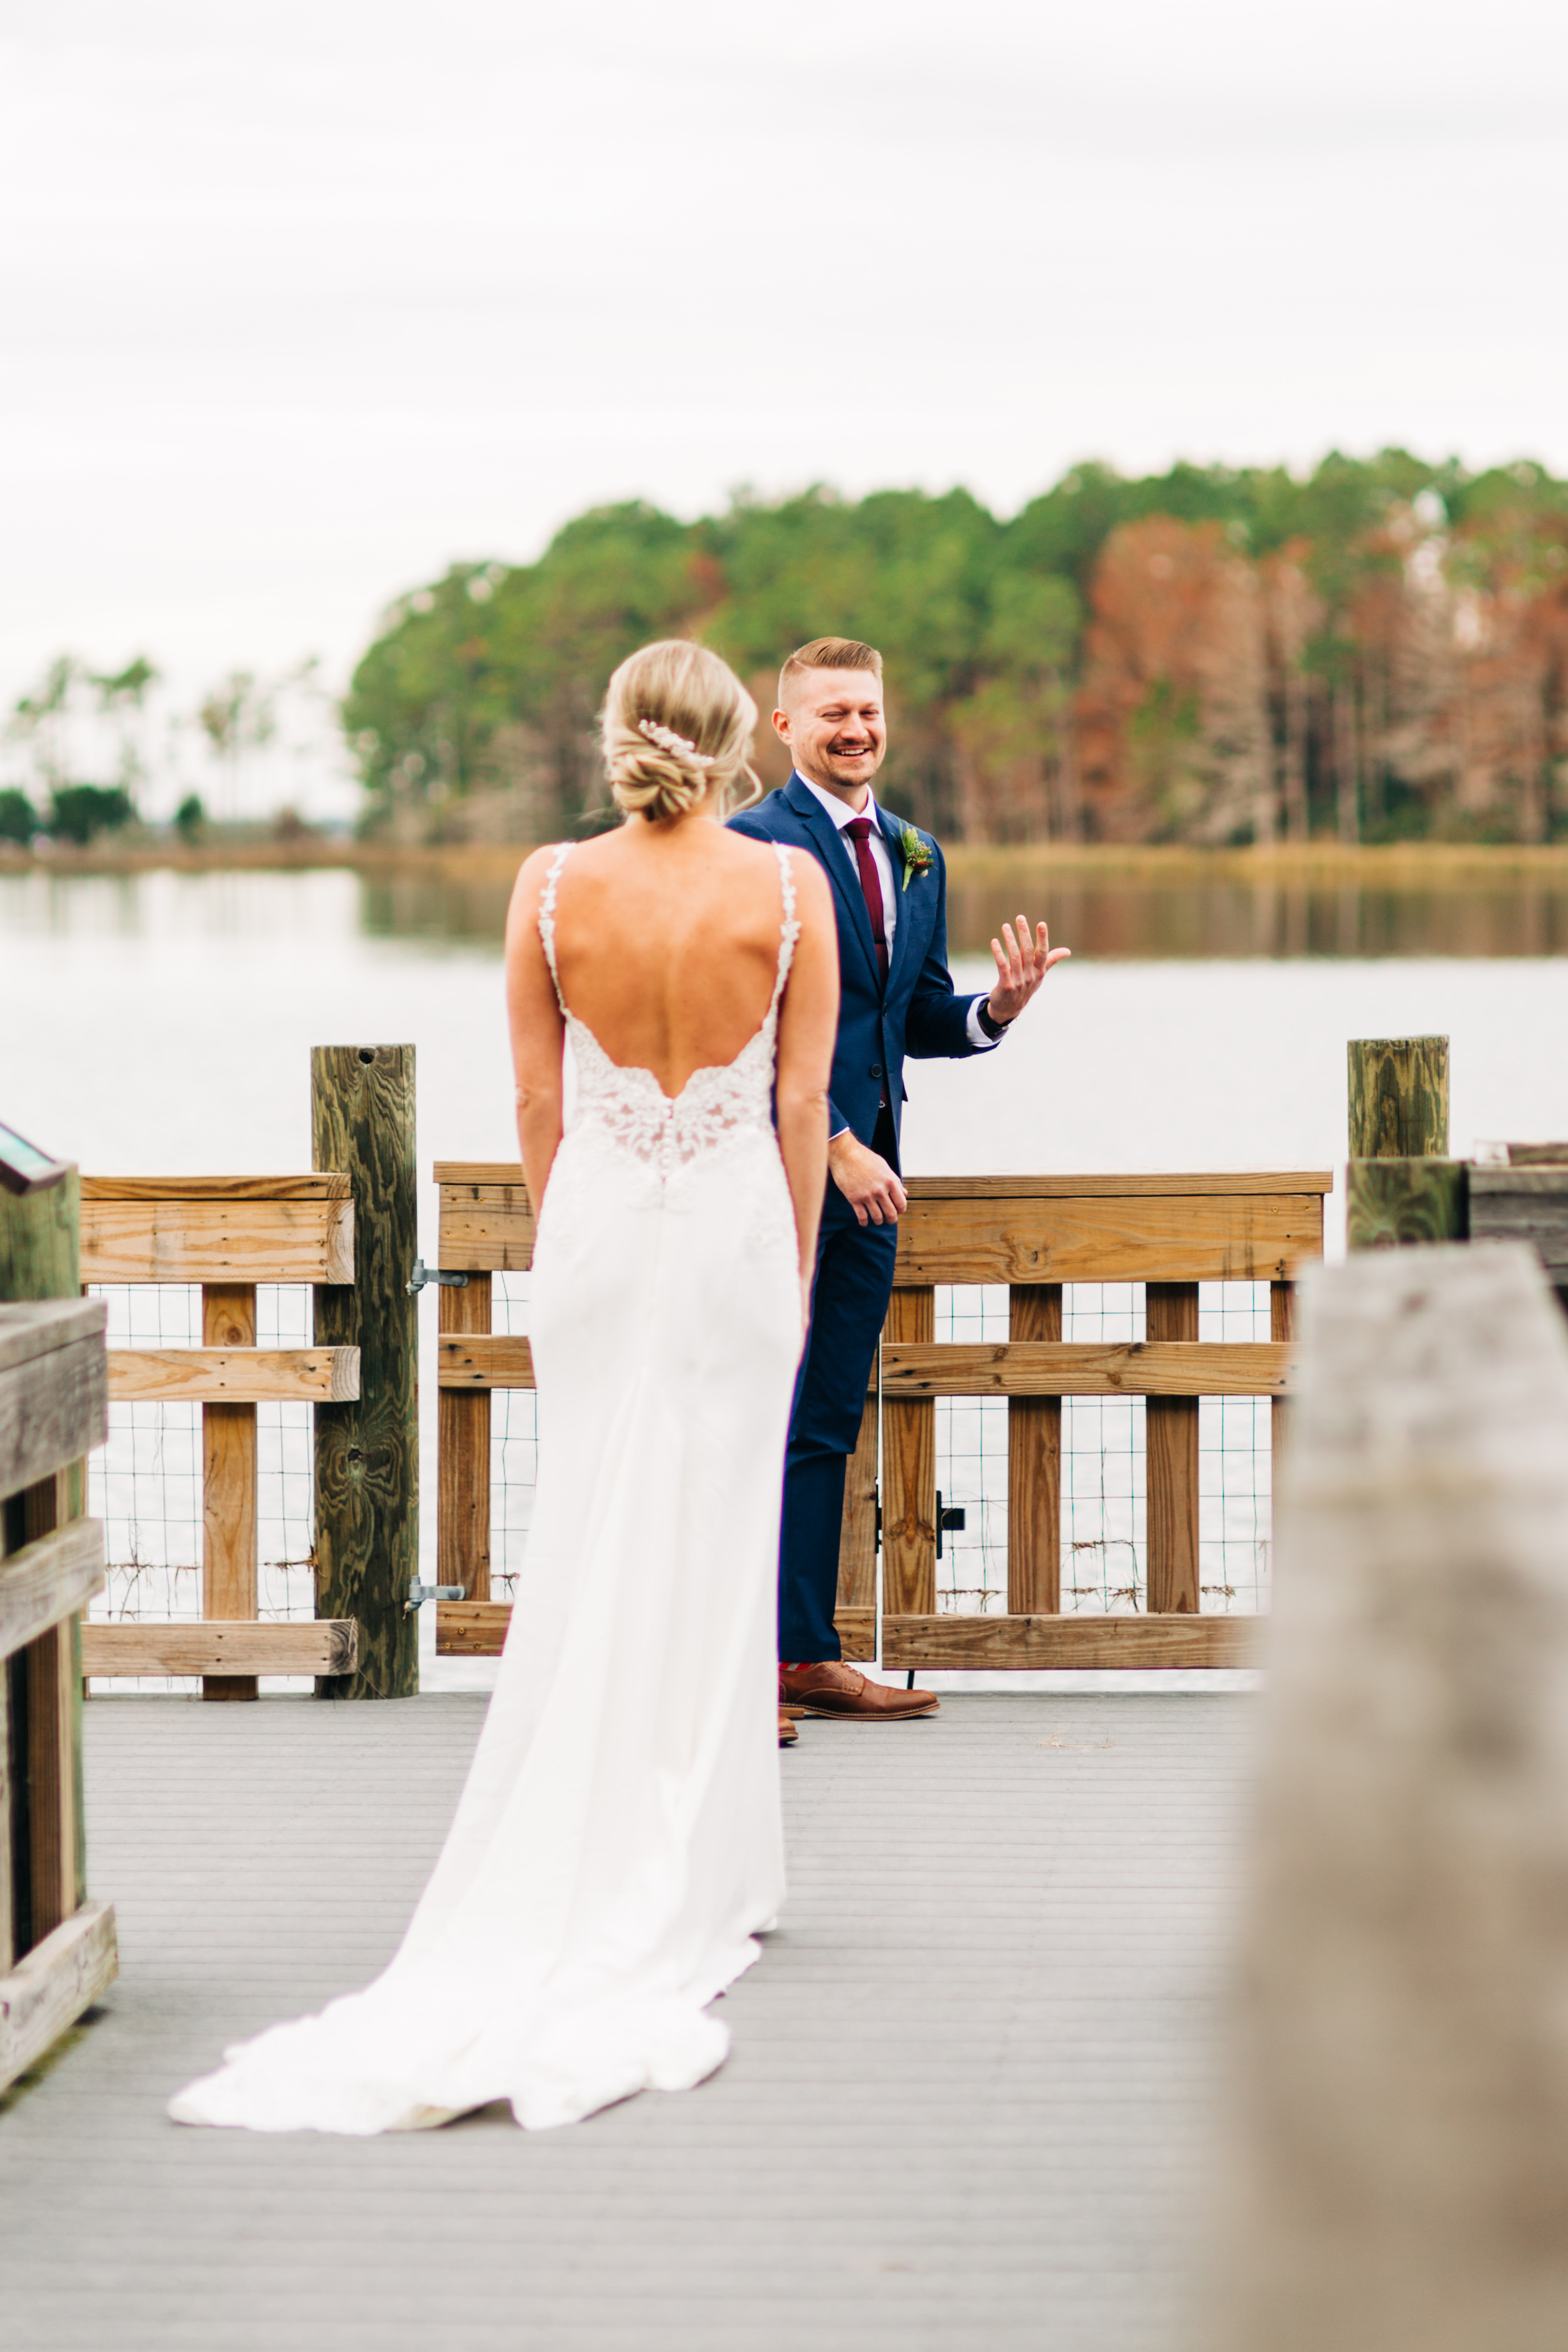 Ricky & Brittney - Pre Ceremony - Jake & Katie Photography_321.jpg